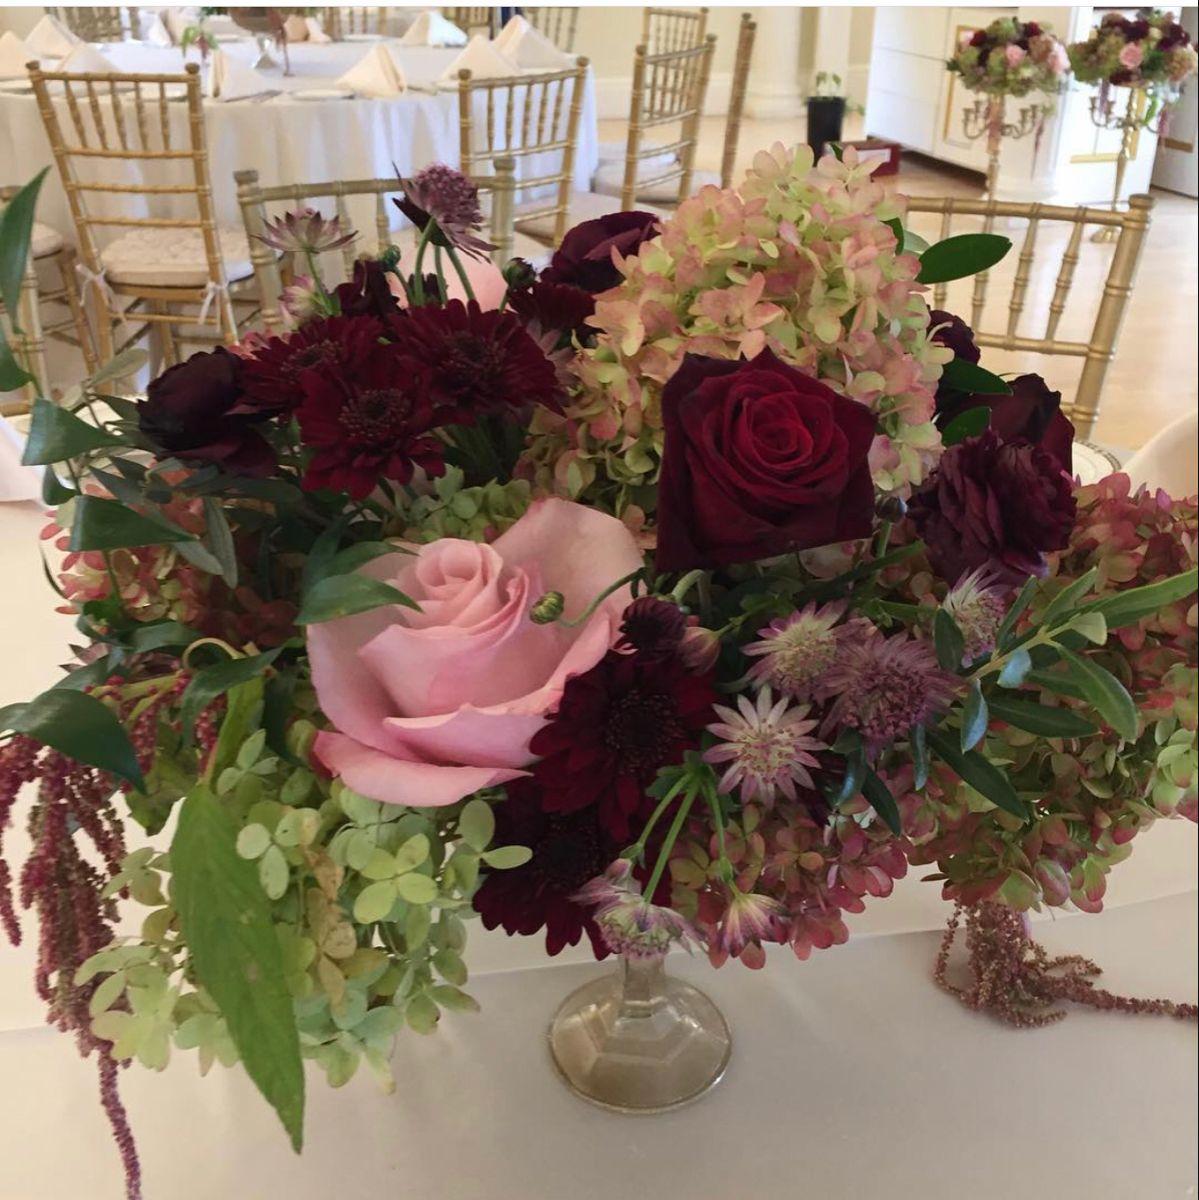 Burgundy Flowers In 2020 Burgundy Flowers Burgundy Wedding Flowers Wedding Flowers